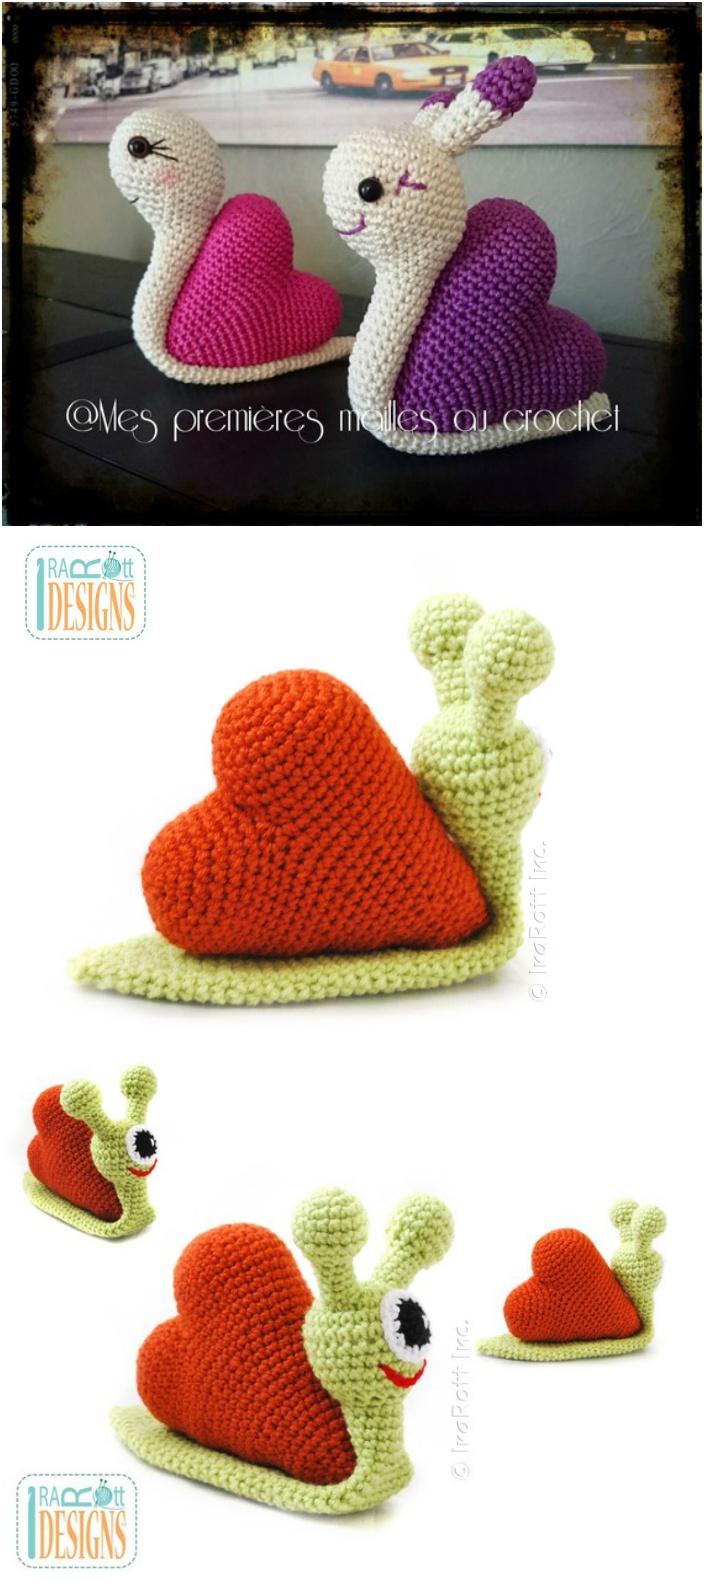 Crochet Amigurumi Snail Patterns - Page 2 of 2